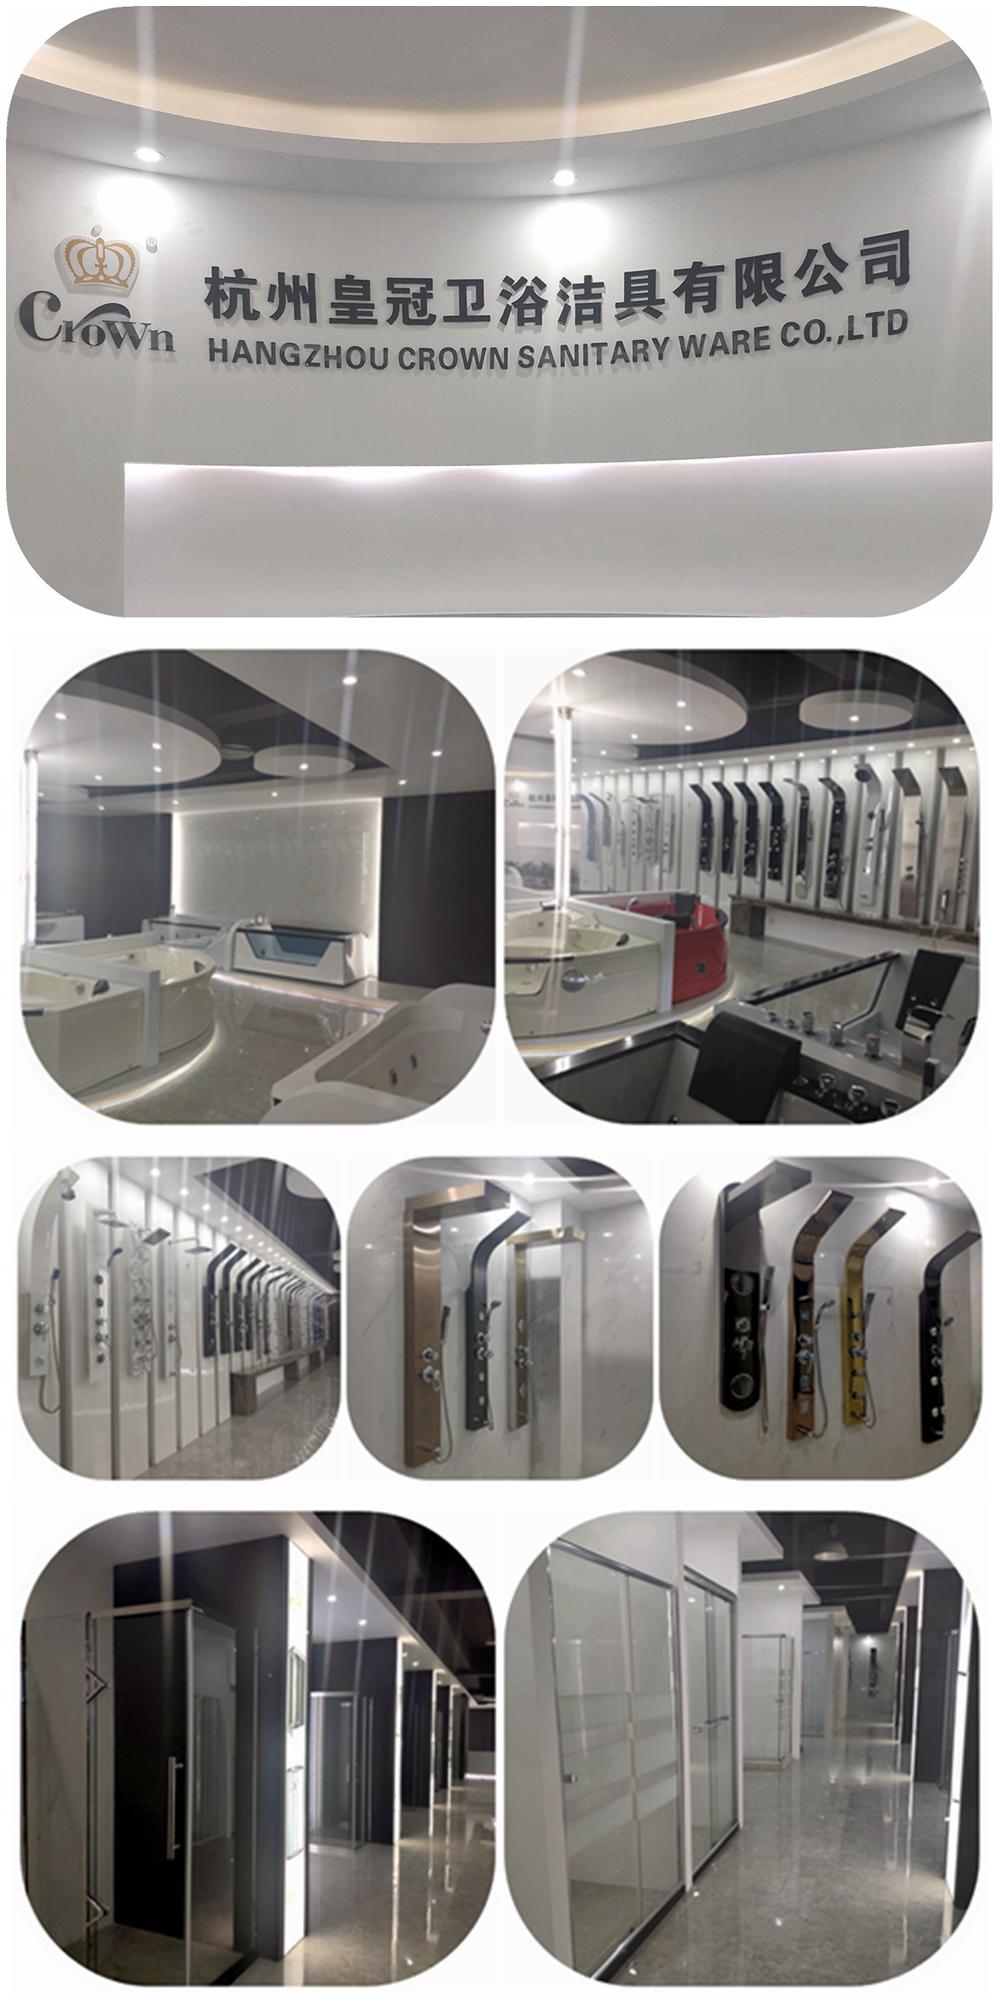 Cabina de ducha prefabricada de lujo, panel de acceso, cuarto de ducha de hidromasaje, caja doccia